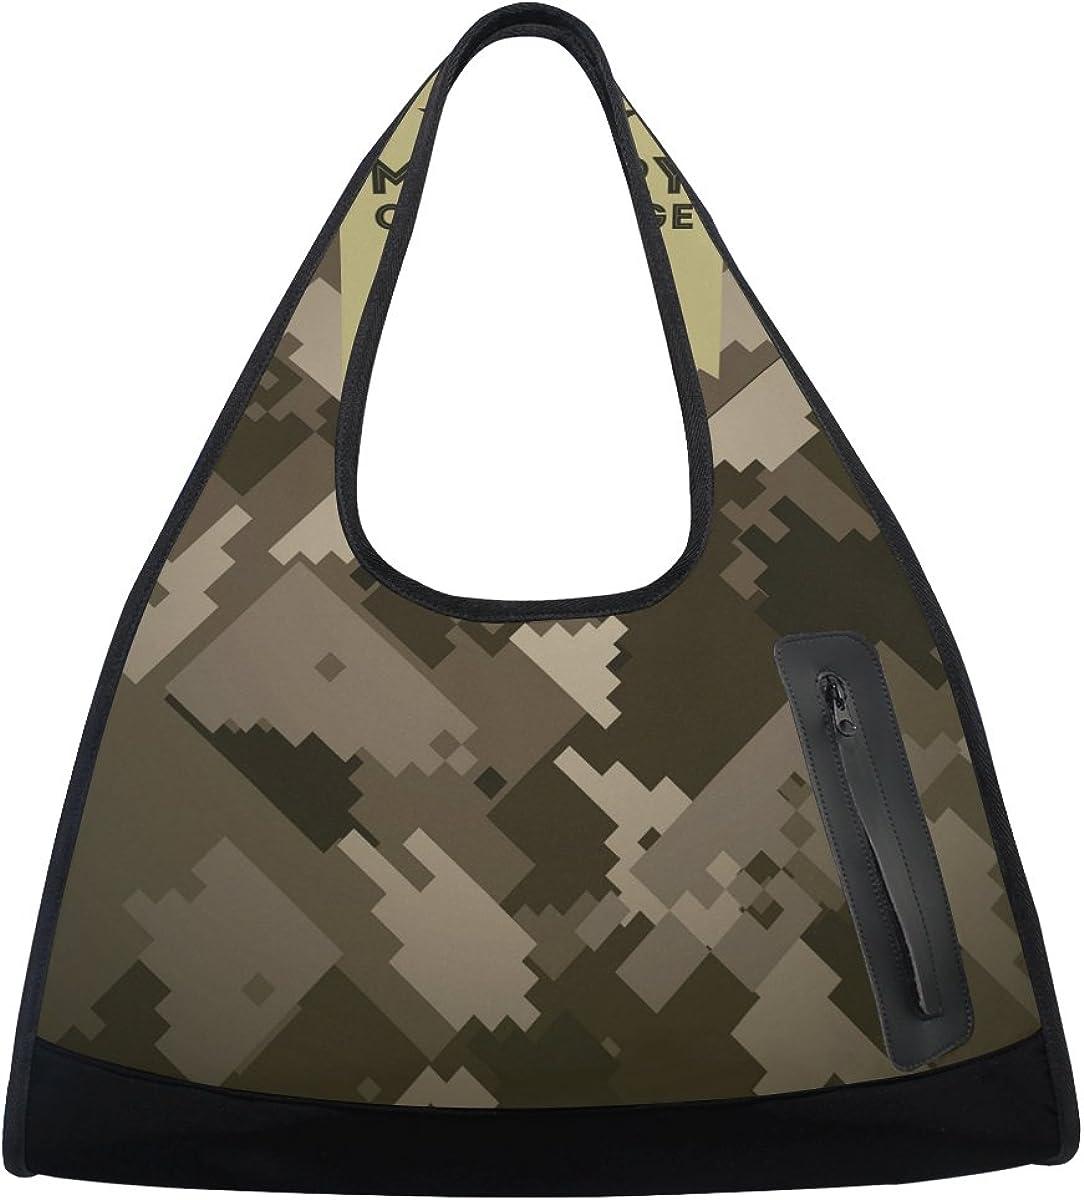 Gym Bag Sports Holdall Mosaic Camouflage Canvas Shoulder Bag Overnight Travel Bag for Men and Women